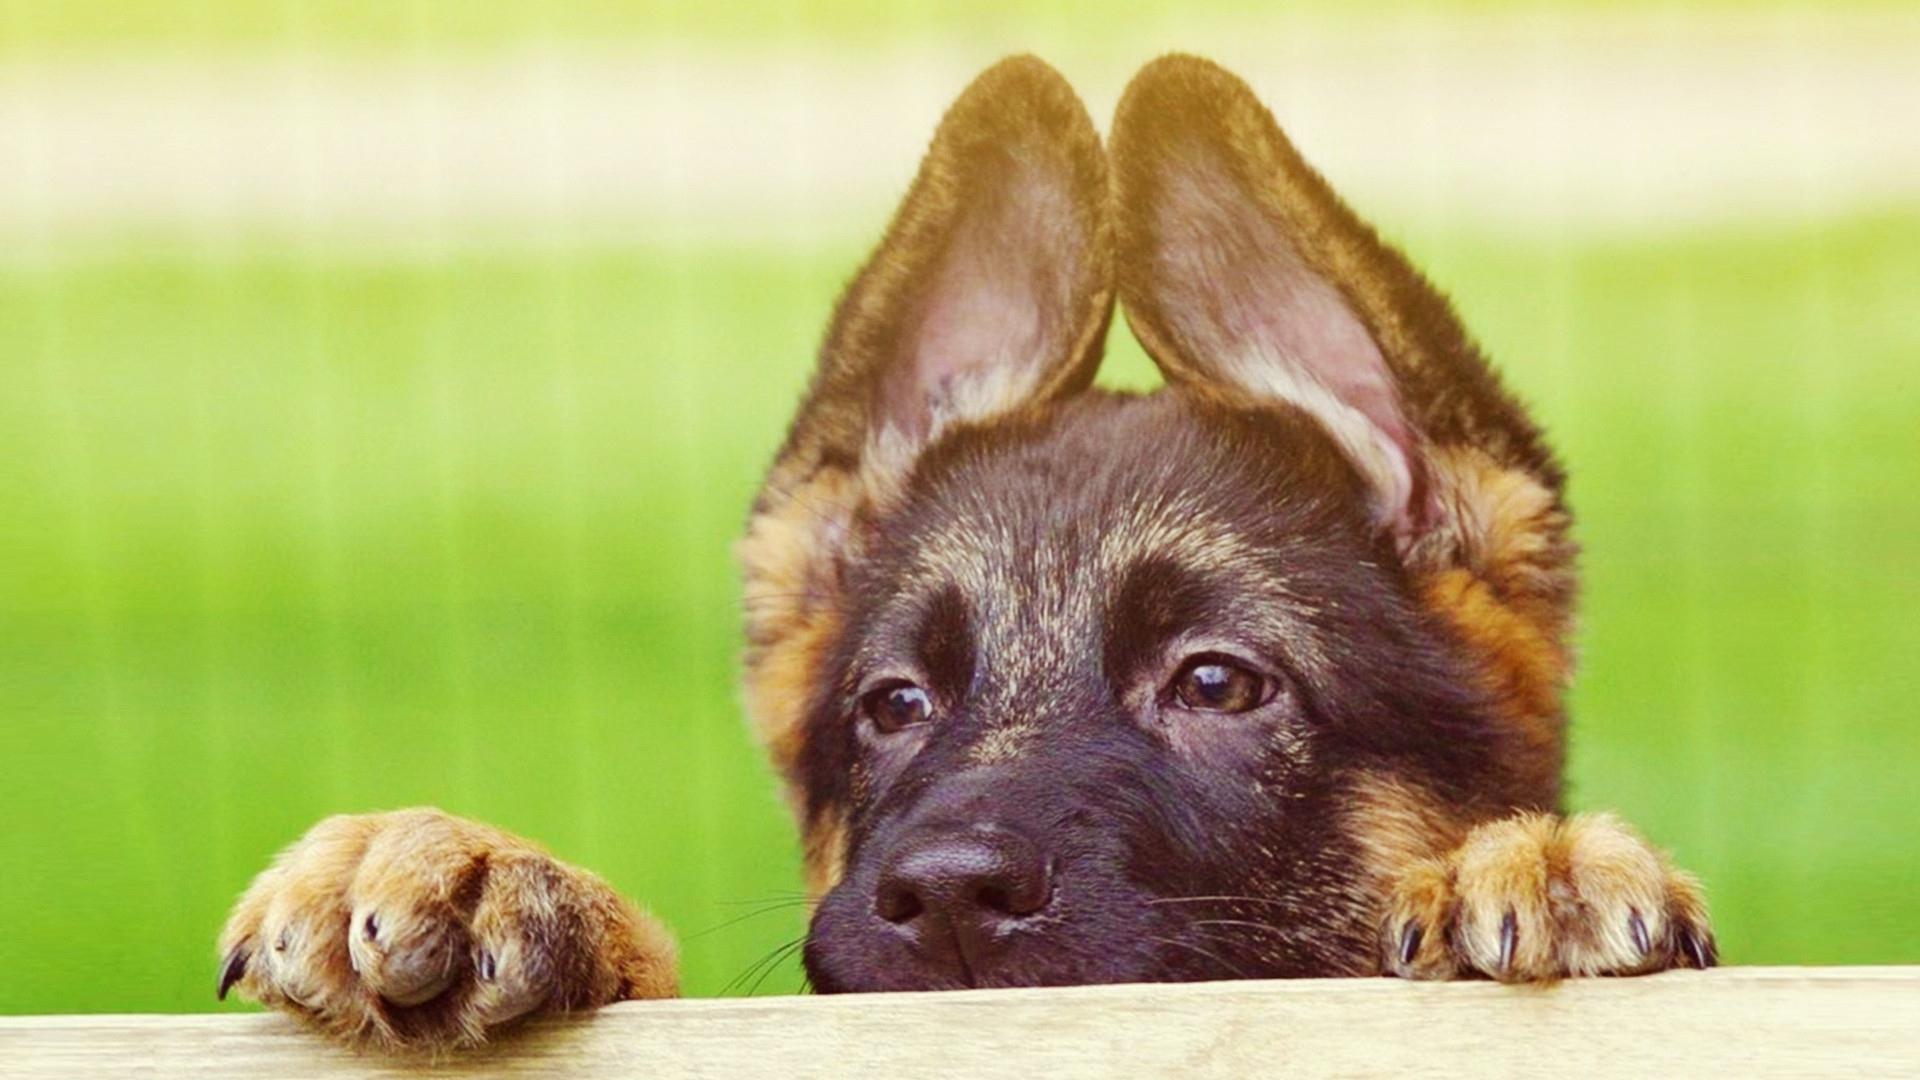 Download Wallpaper puppy face ears cute Full HD 1080p